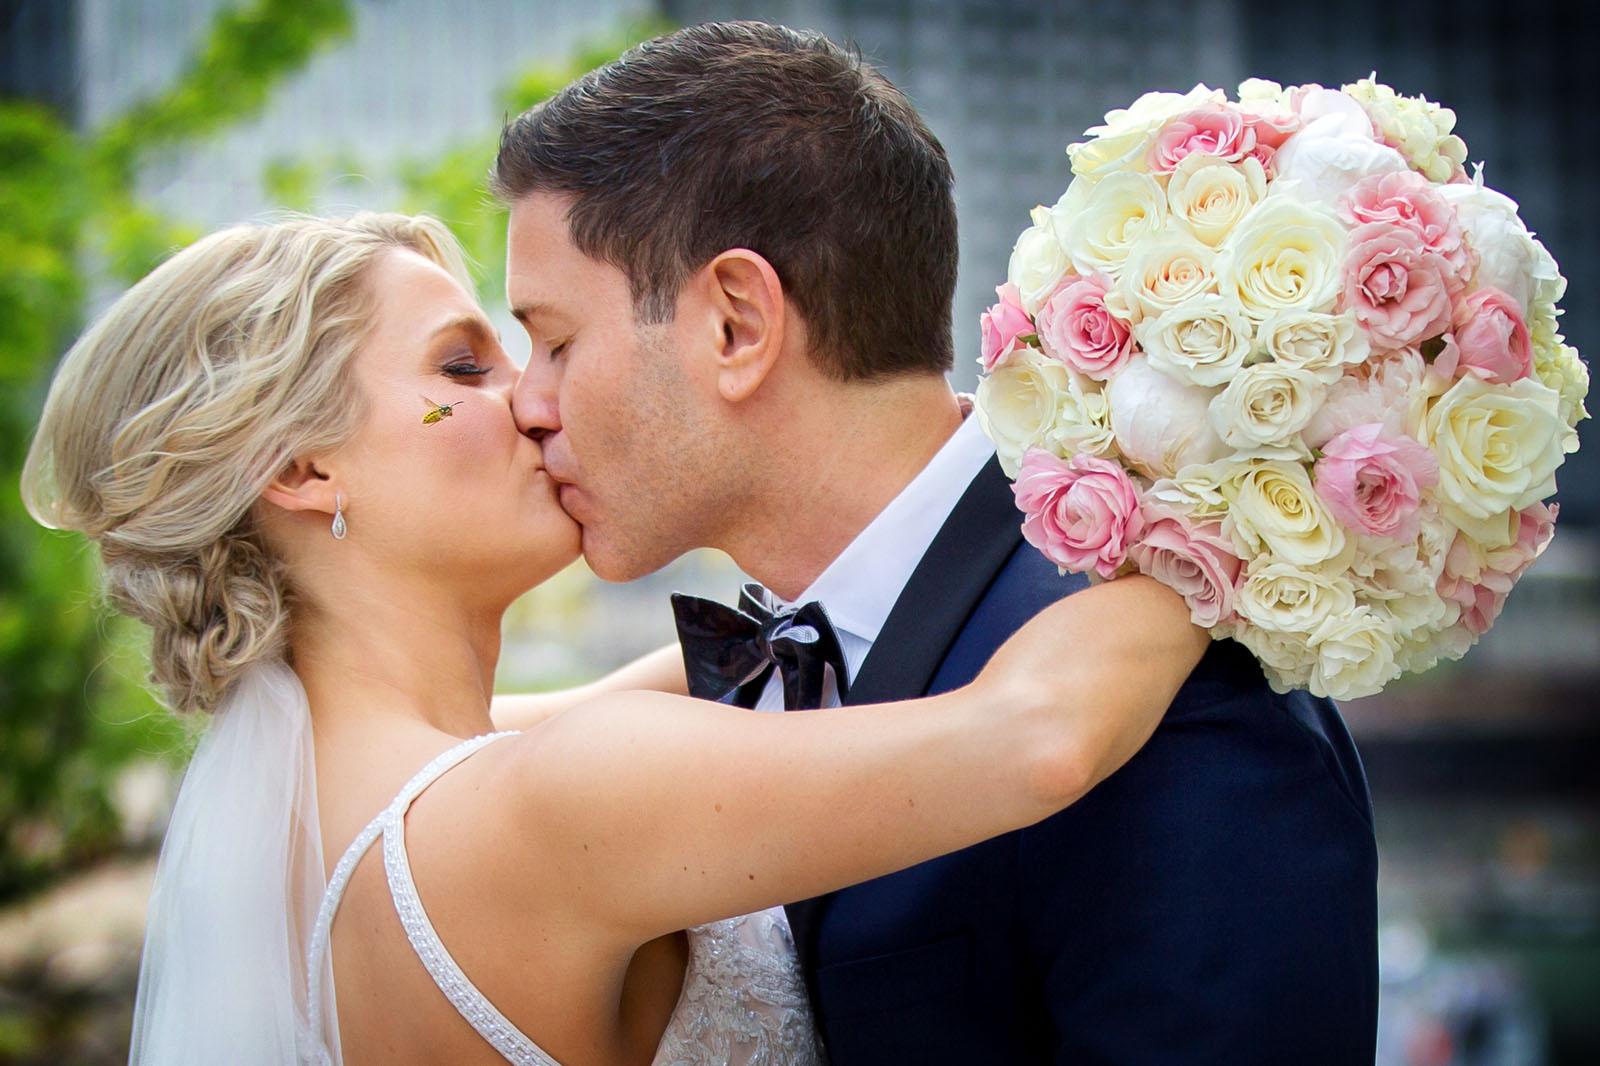 Kissing newlyweds bee buzzing